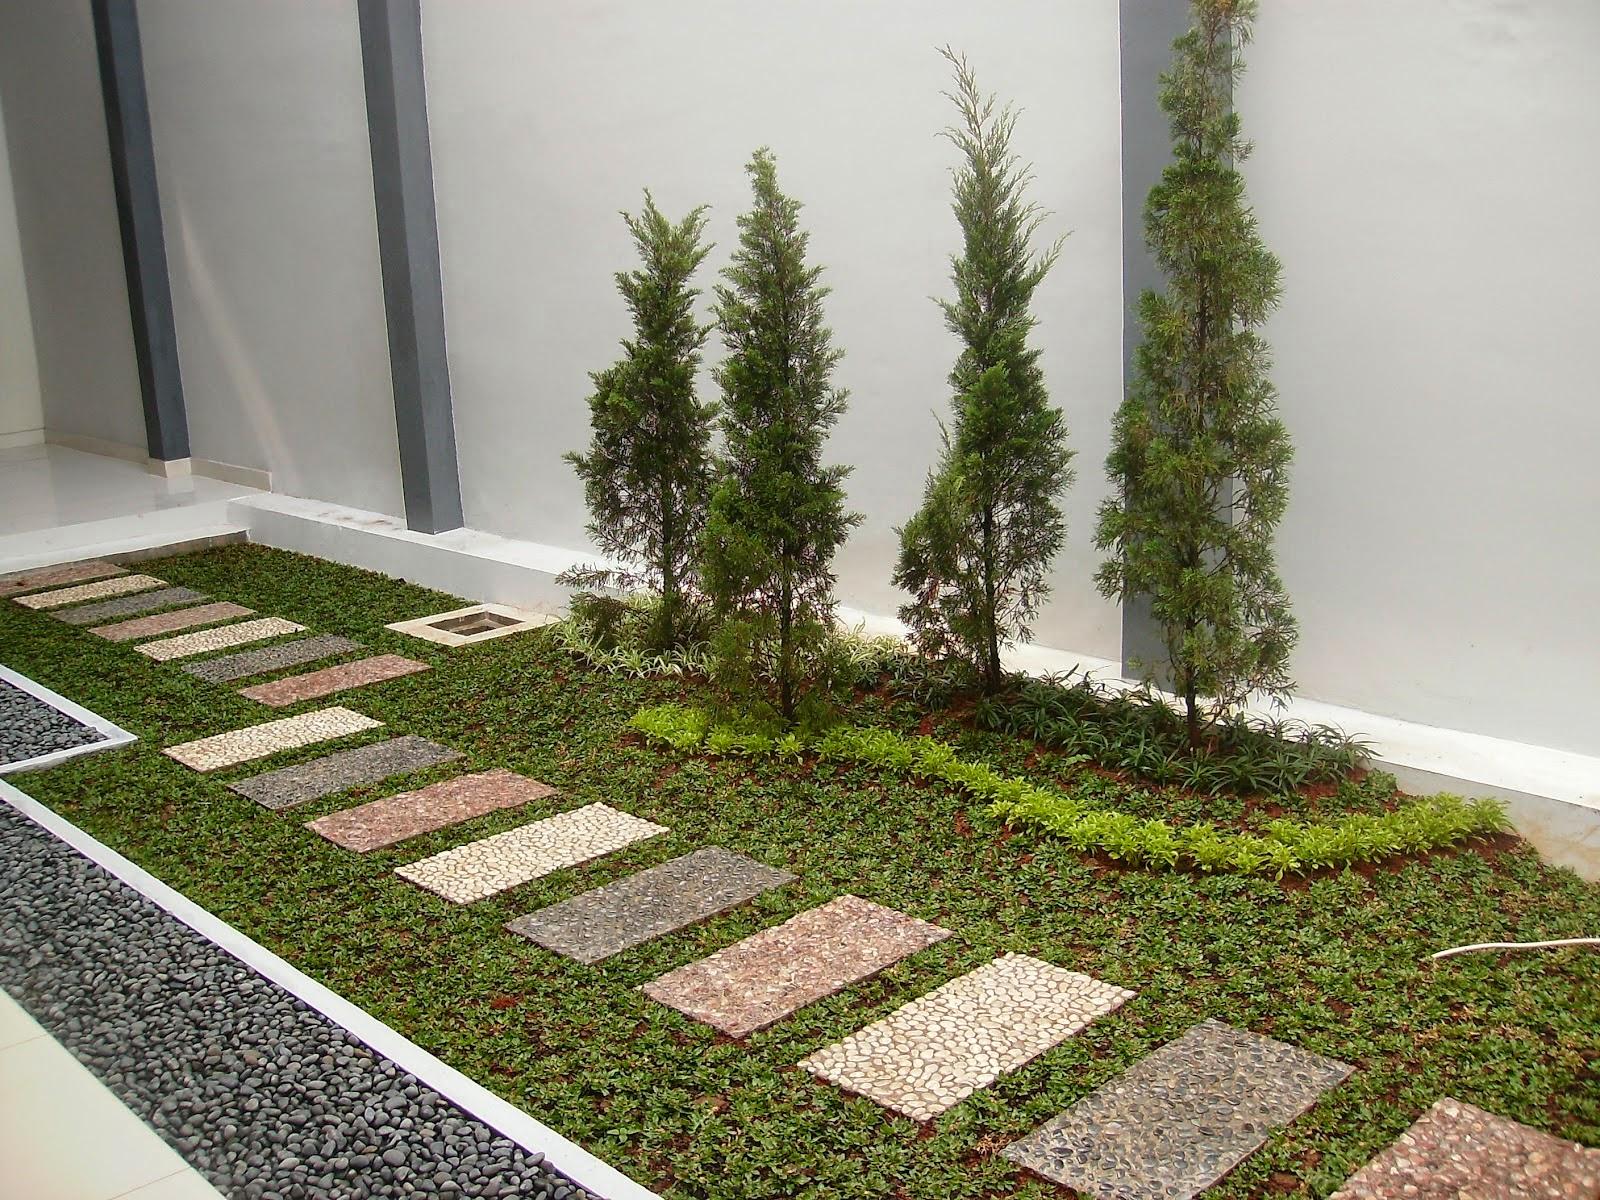 Jasa desain taman | jasa tanam rumput | suplier tanaman | tanaman hias